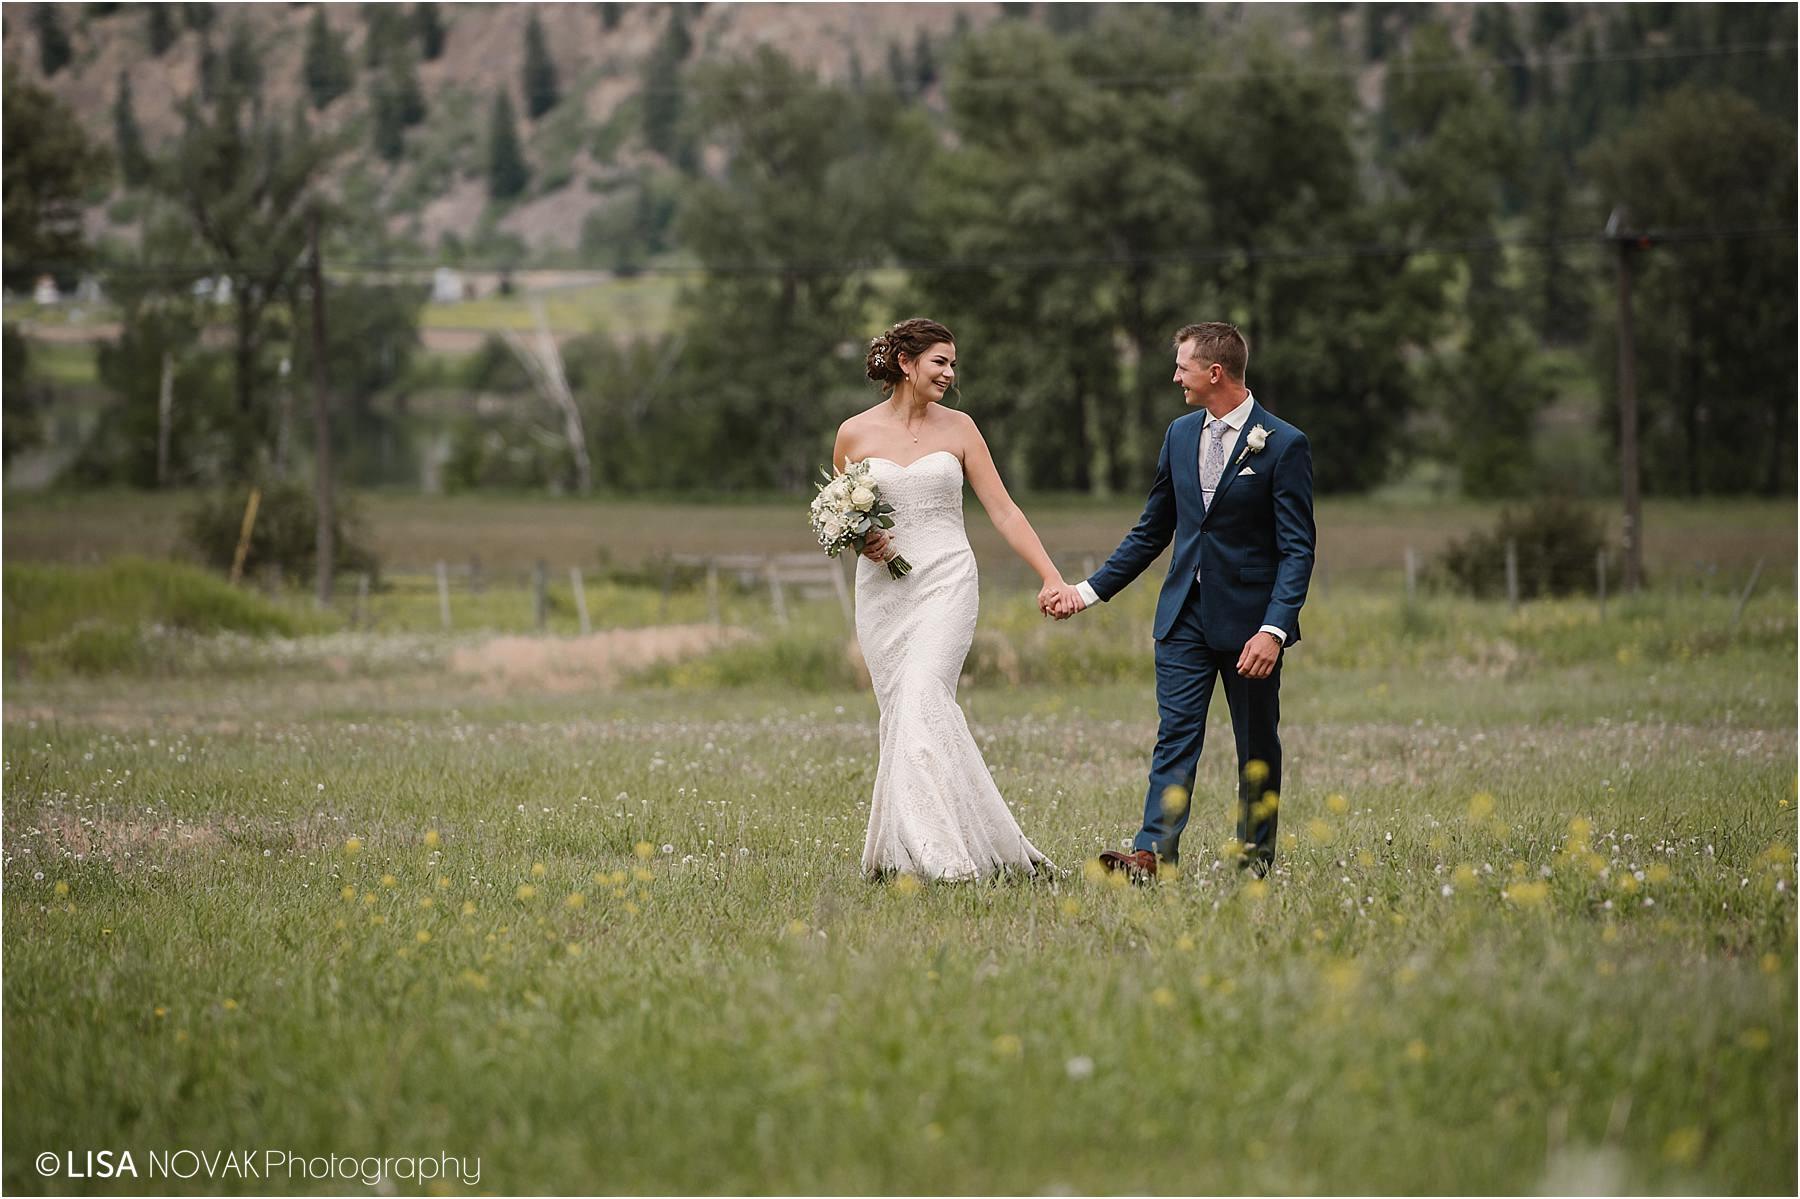 Okanagan wedding photographer field flowers view bride groom romantic epic mountain bridal portraits Barriere blue tux style